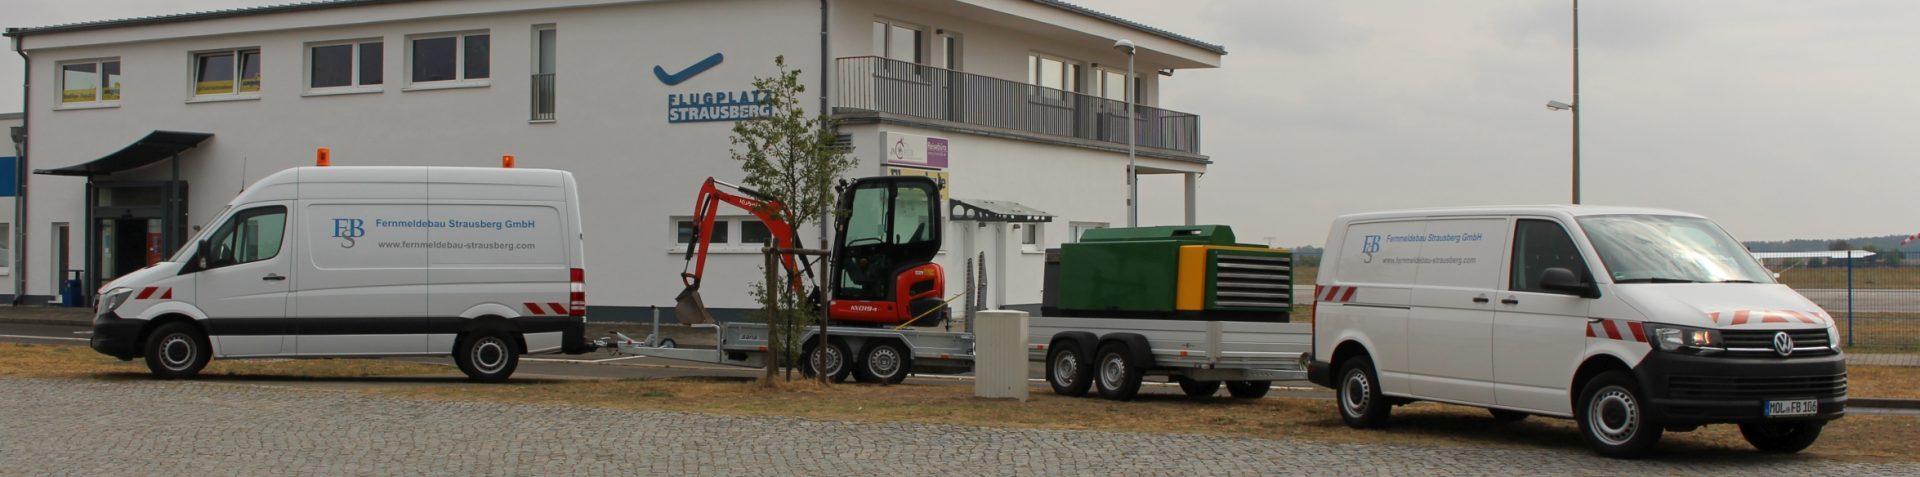 Fernmeldebau Strausberg GmbH